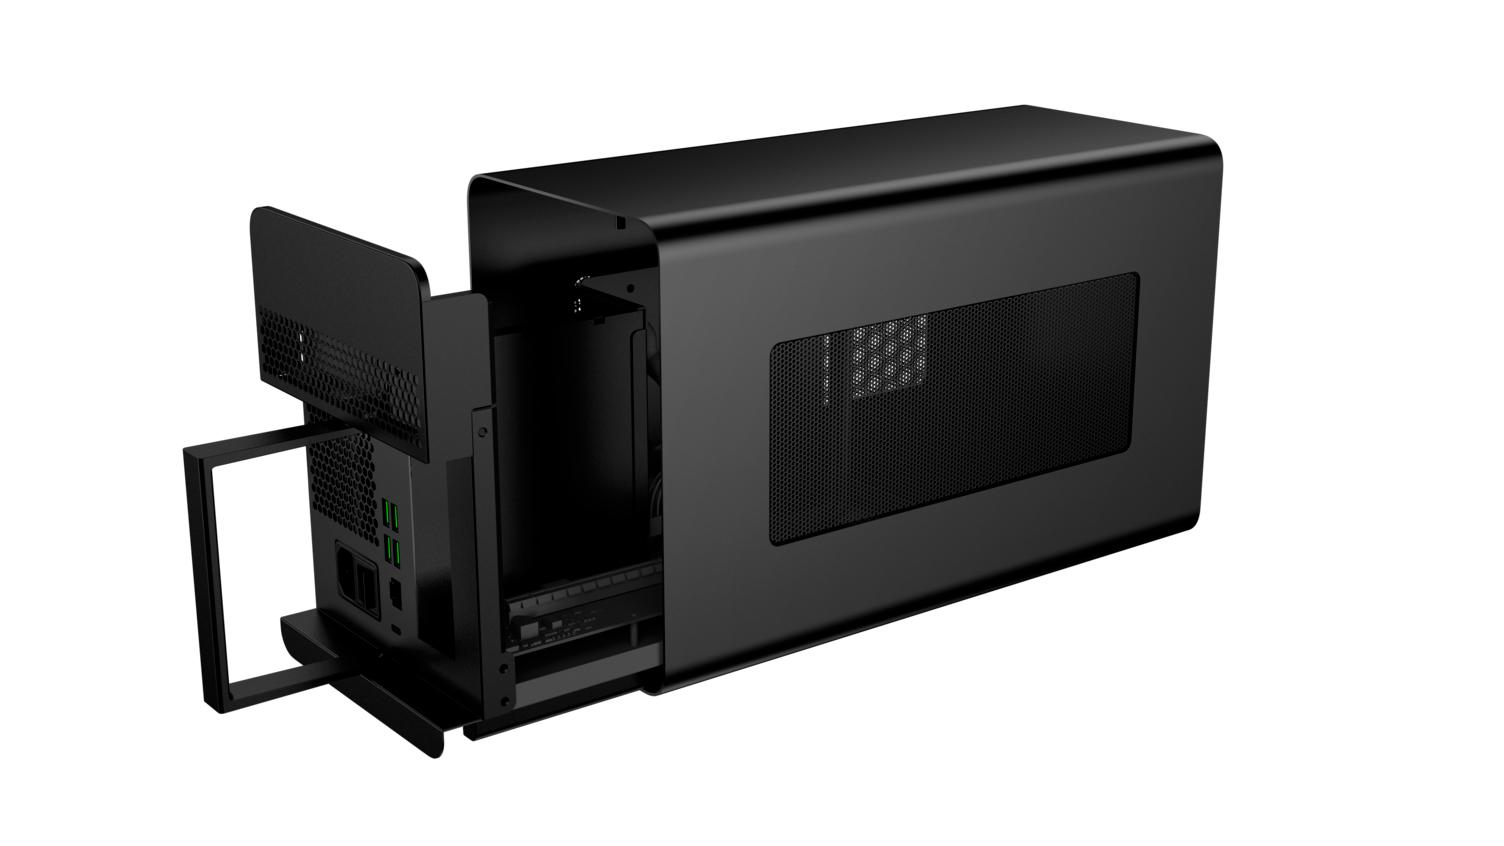 Razer Core X Chroma [2019] - 3 Slide Tray.jpg